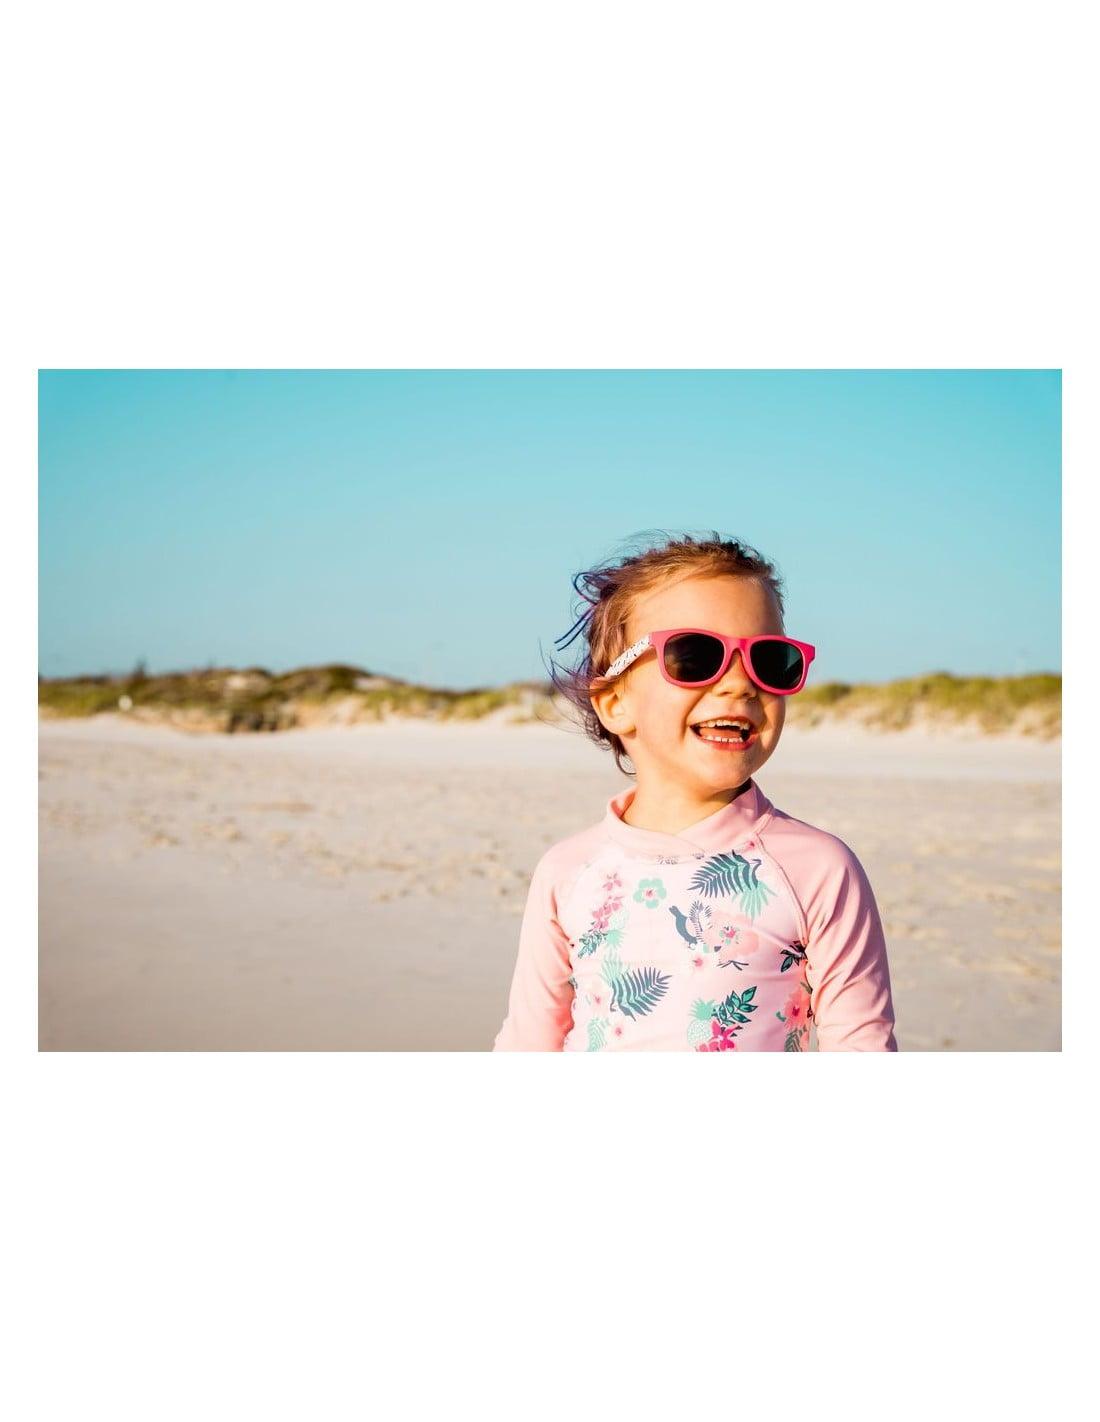 Ochelari de soare 0-2 ani J-Banz Beachcomber Cherry Floral 2